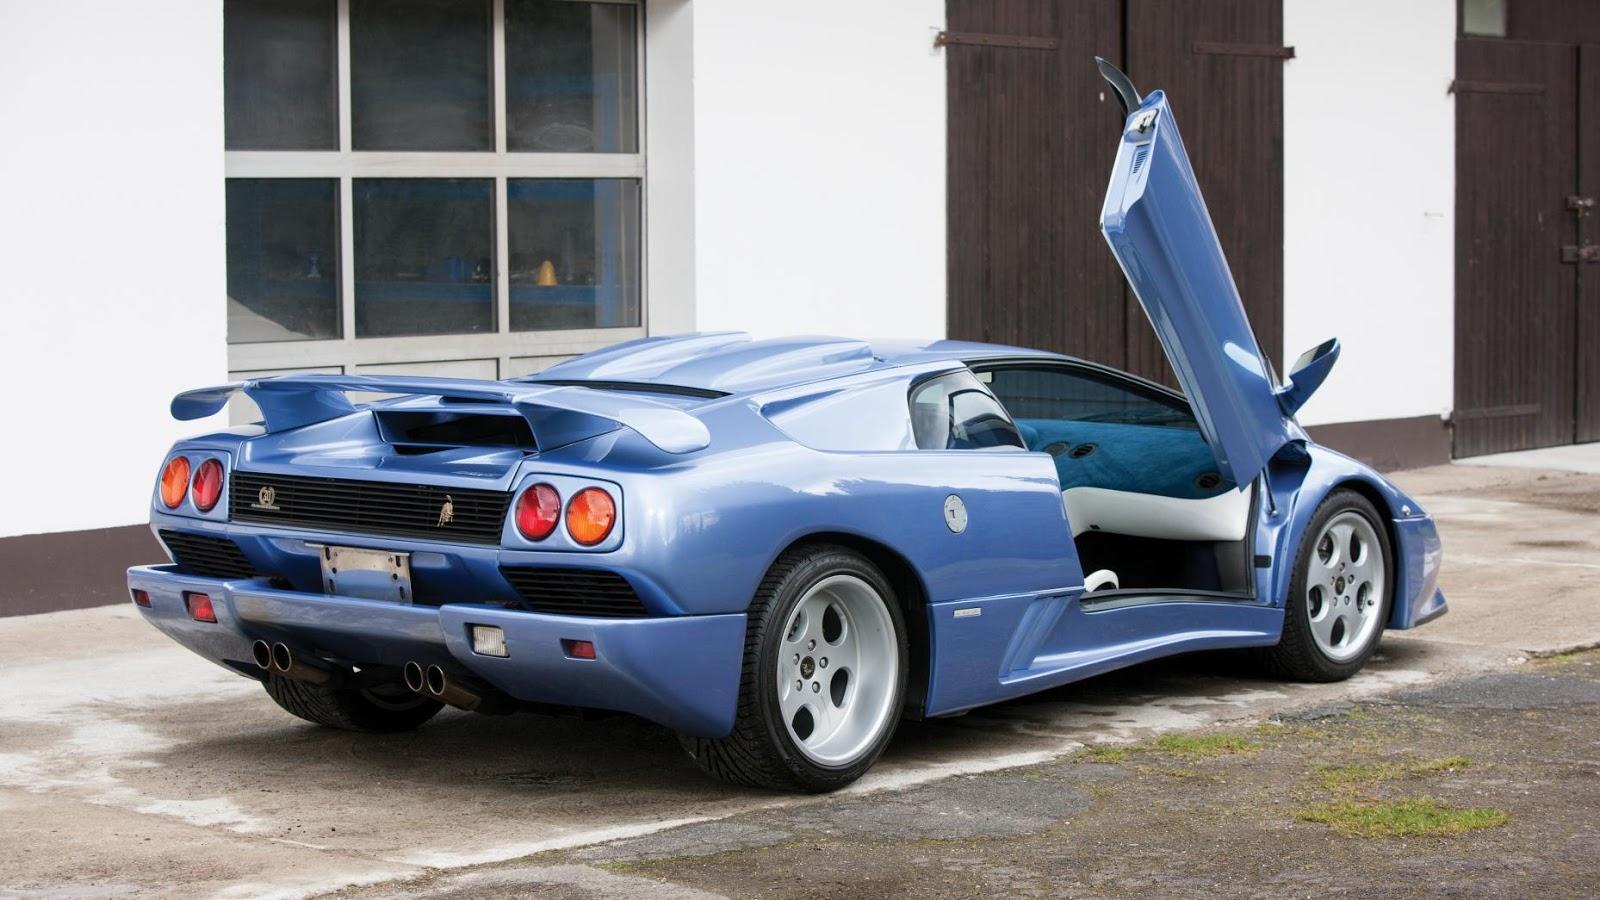 1995 Lamborghini Diablo SE30 Jota - £ 530k